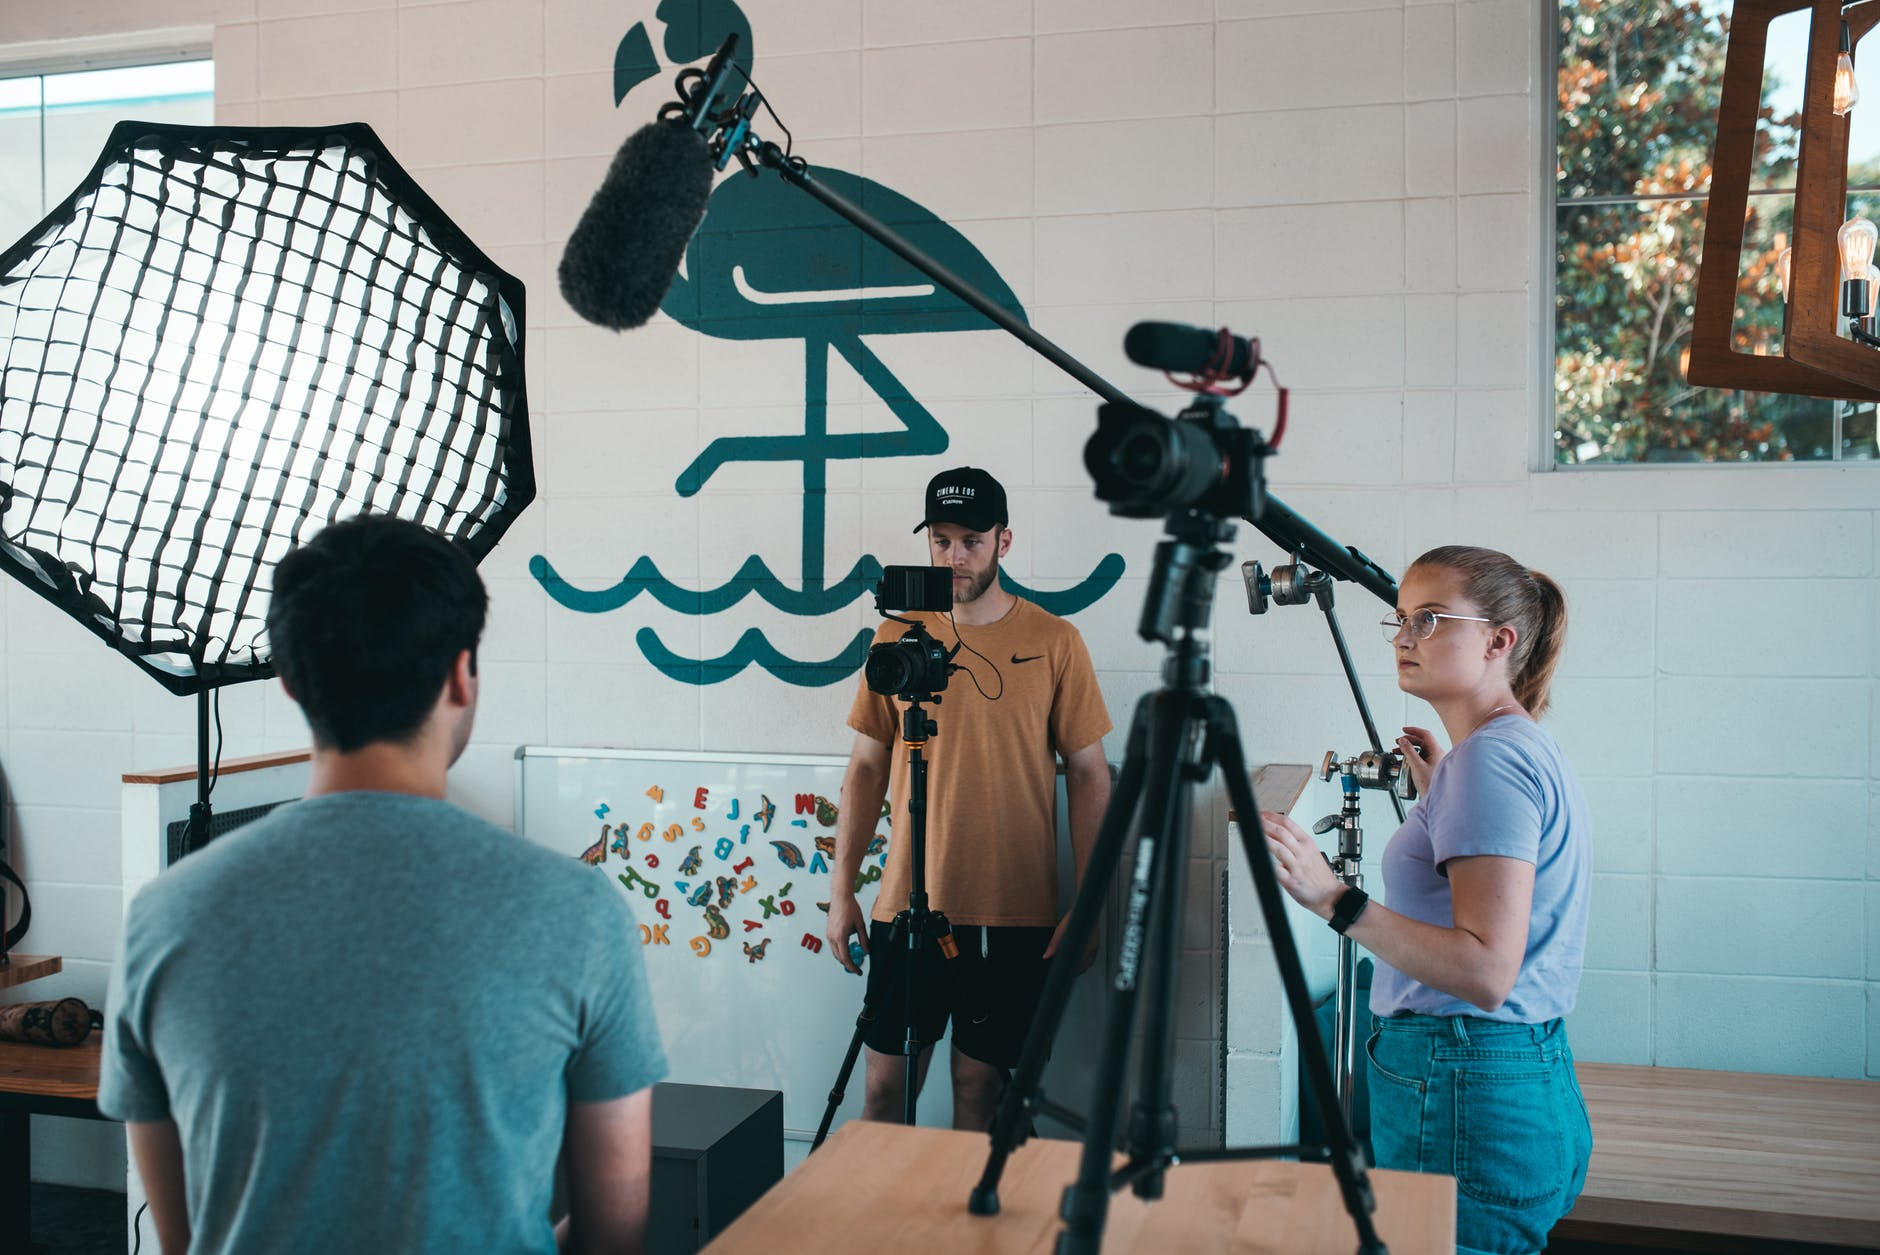 People Filming Scene